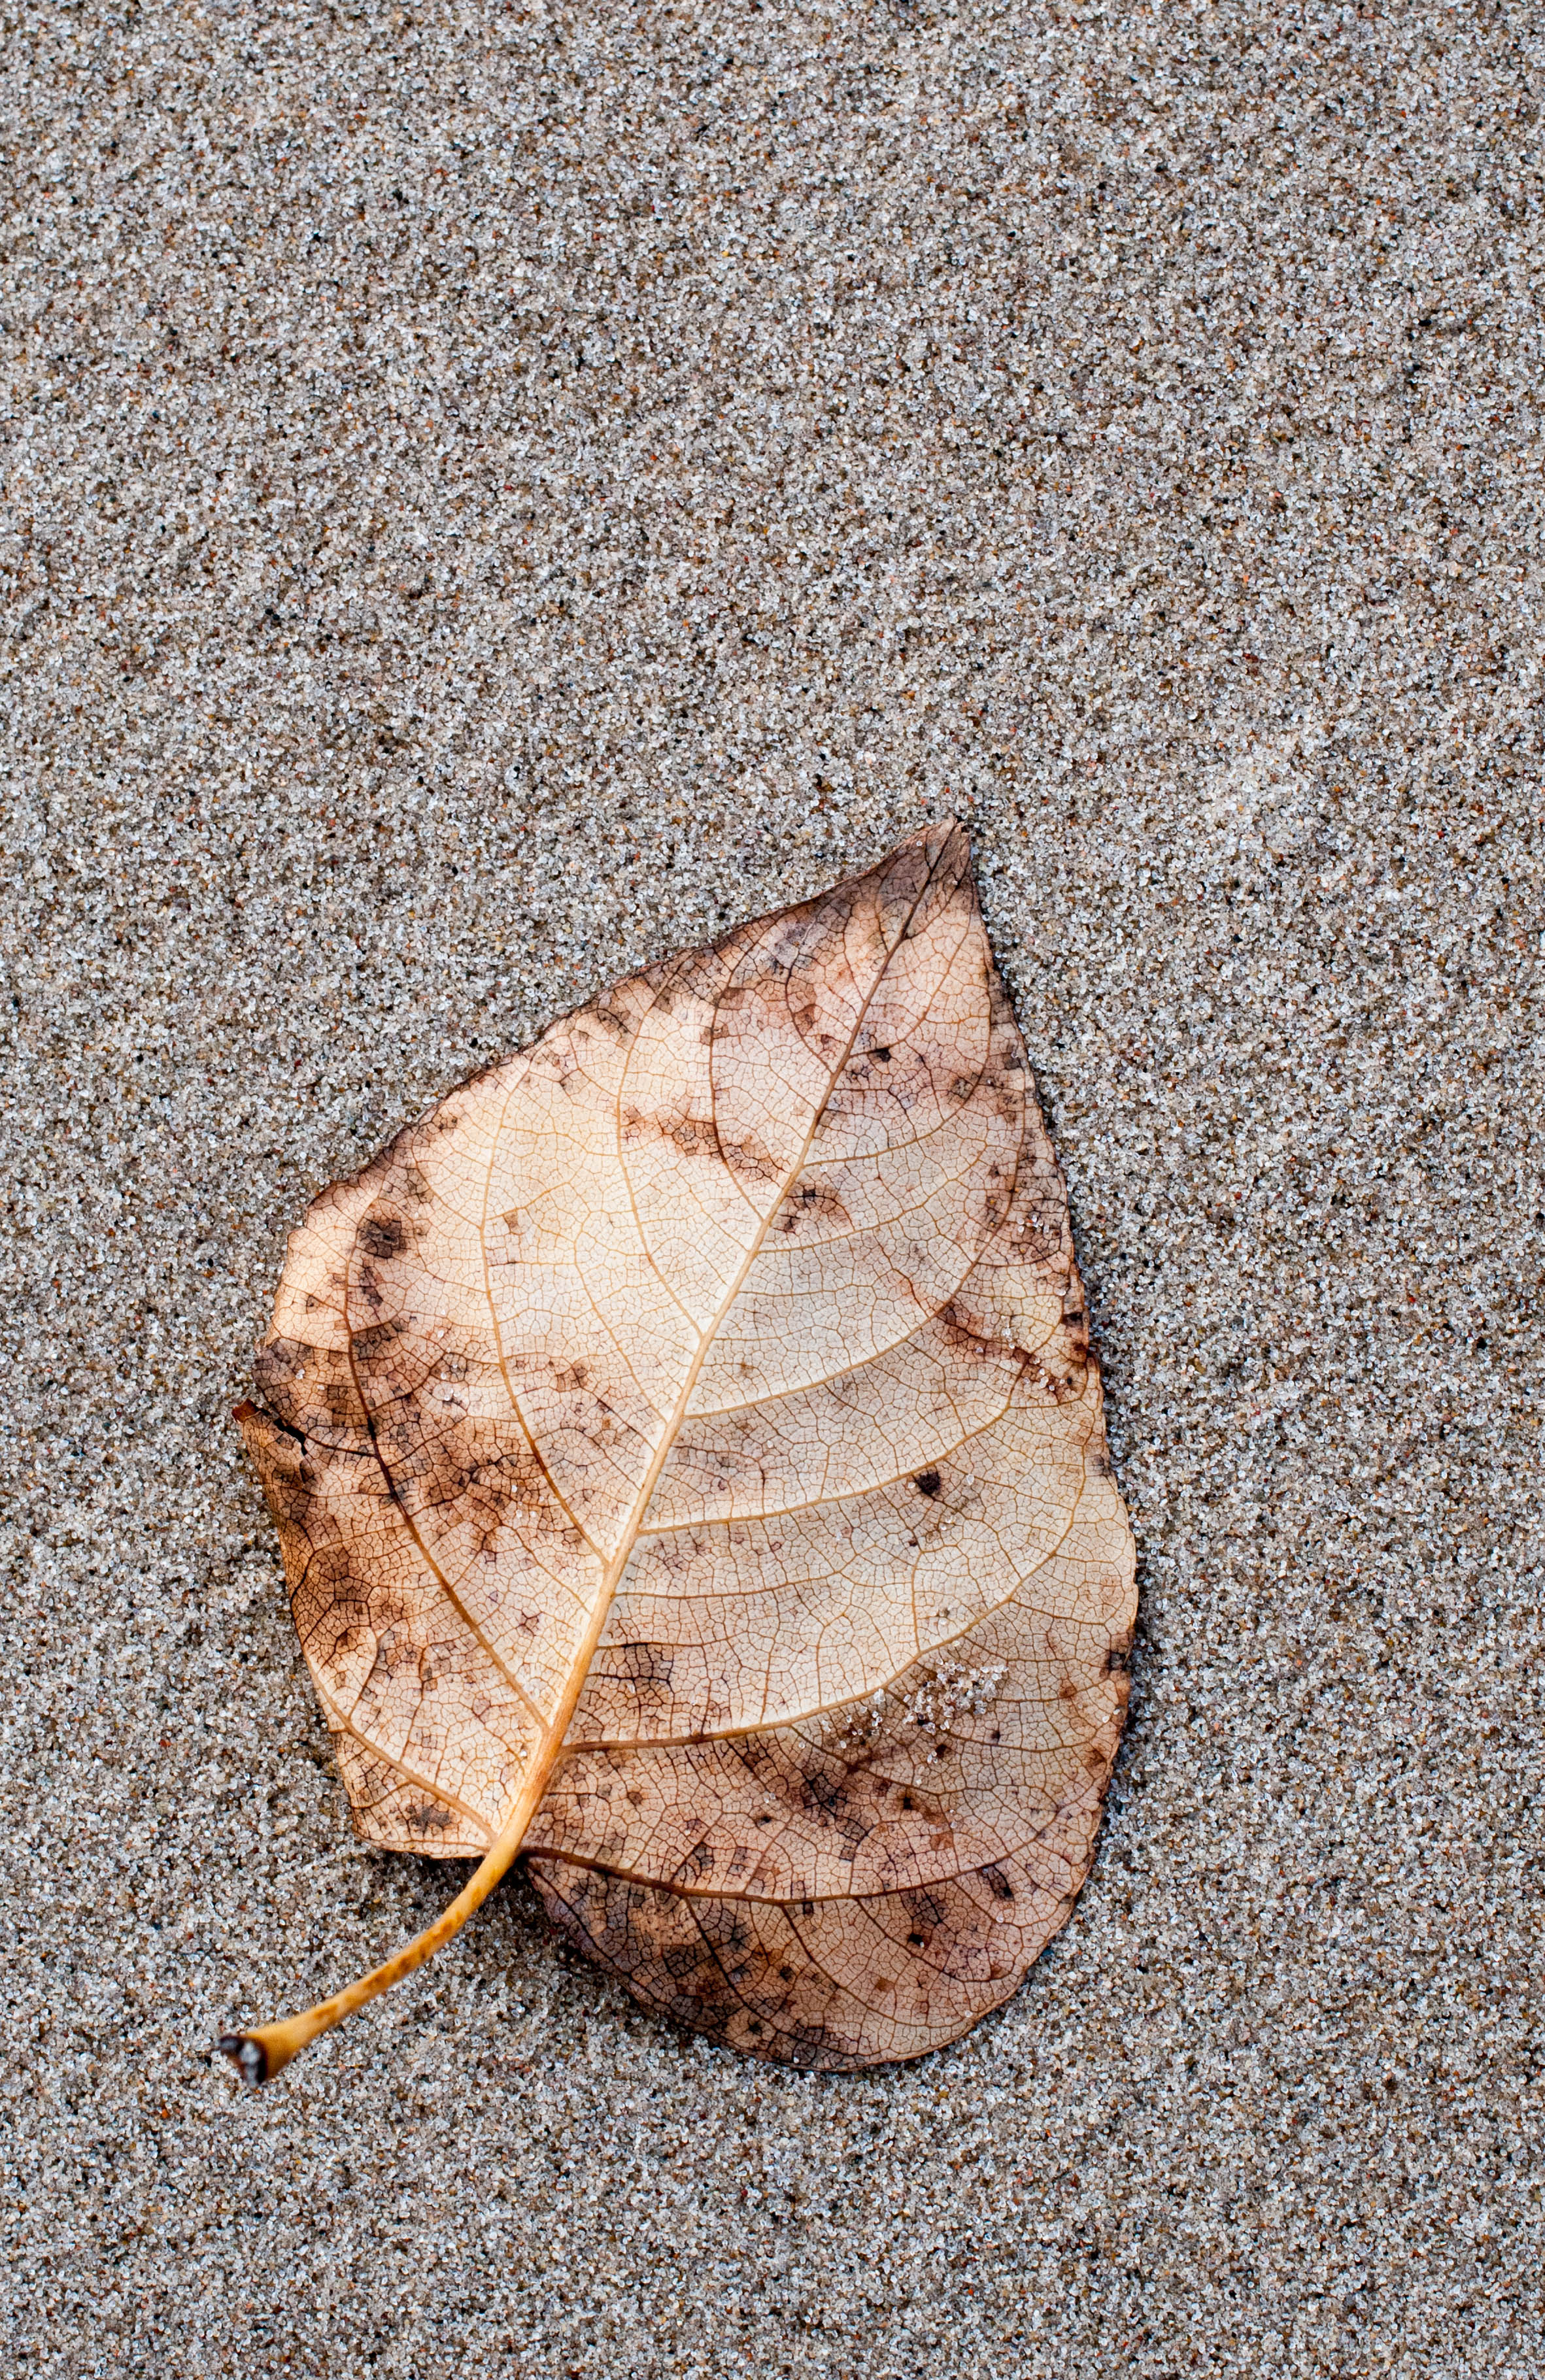 Blatt im Sand